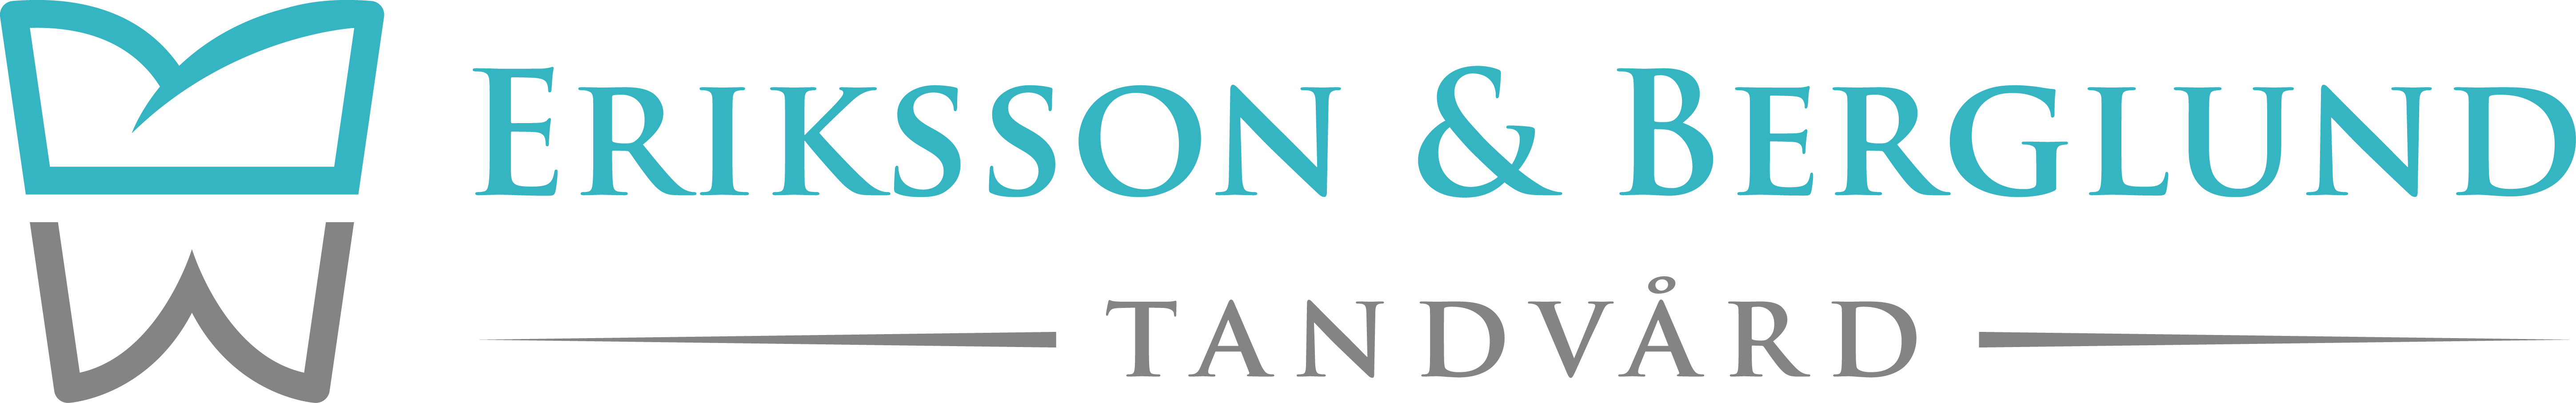 Tandläkare Eriksson & Berglund